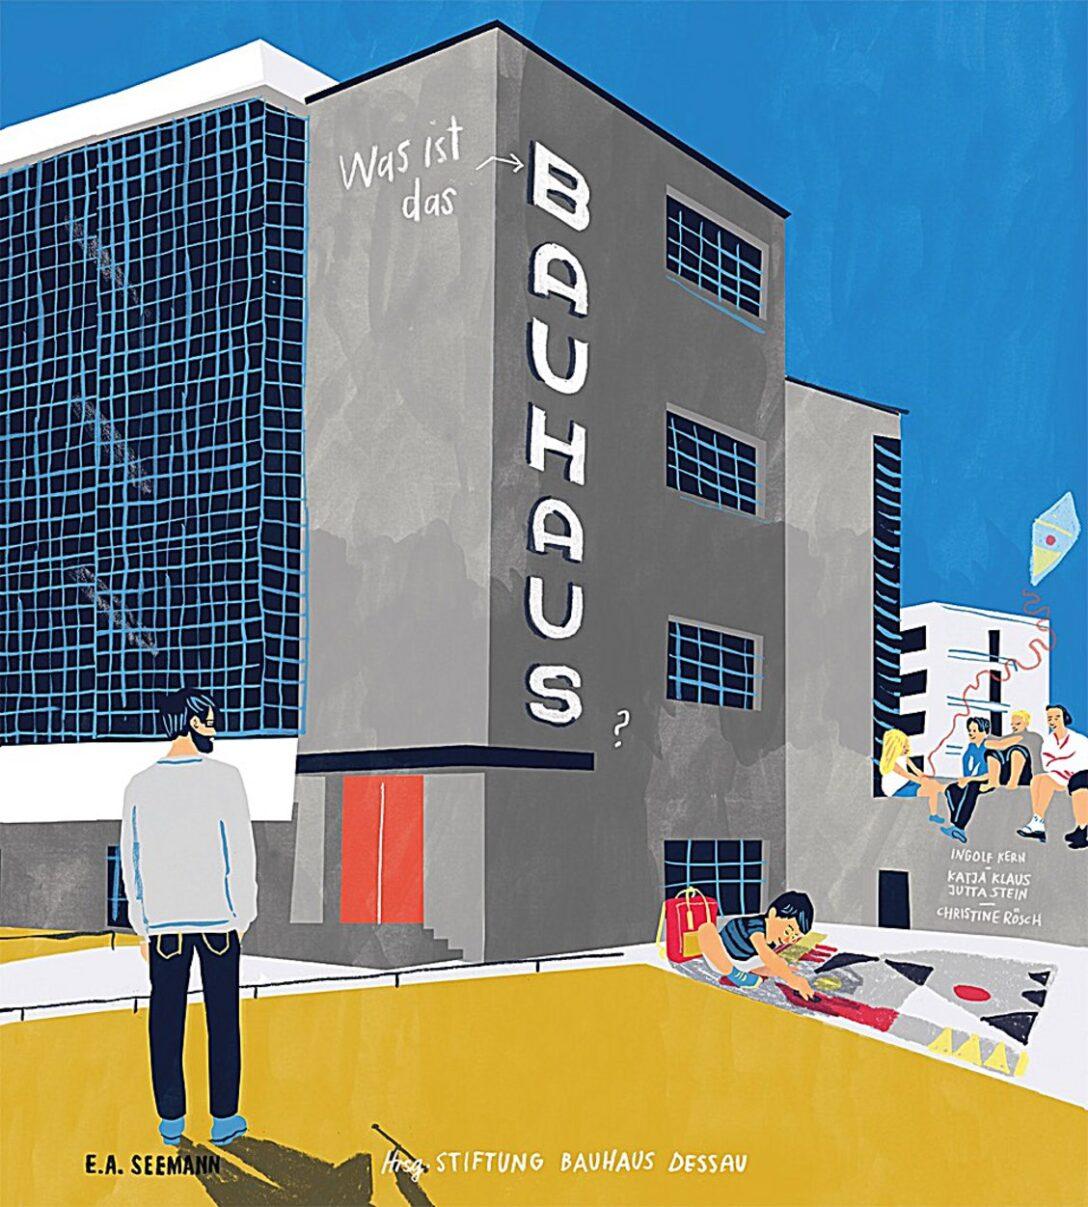 Large Size of Heizkörper Bauhaus Was Ist Das Entdecken In Dessau Elektroheizkörper Bad Fenster Wohnzimmer Für Badezimmer Wohnzimmer Heizkörper Bauhaus